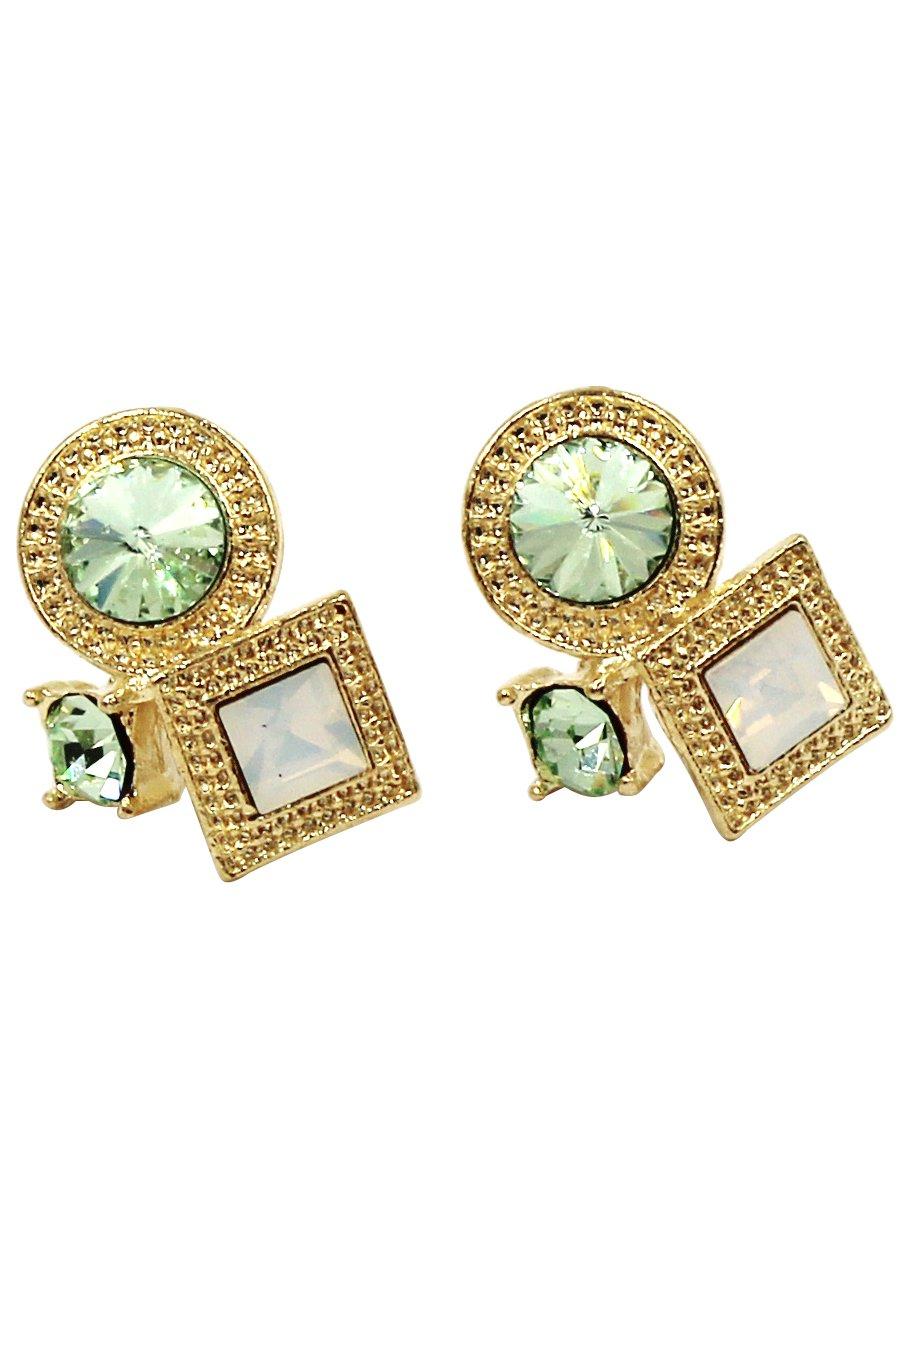 Fashion golden rim green crystal earrings